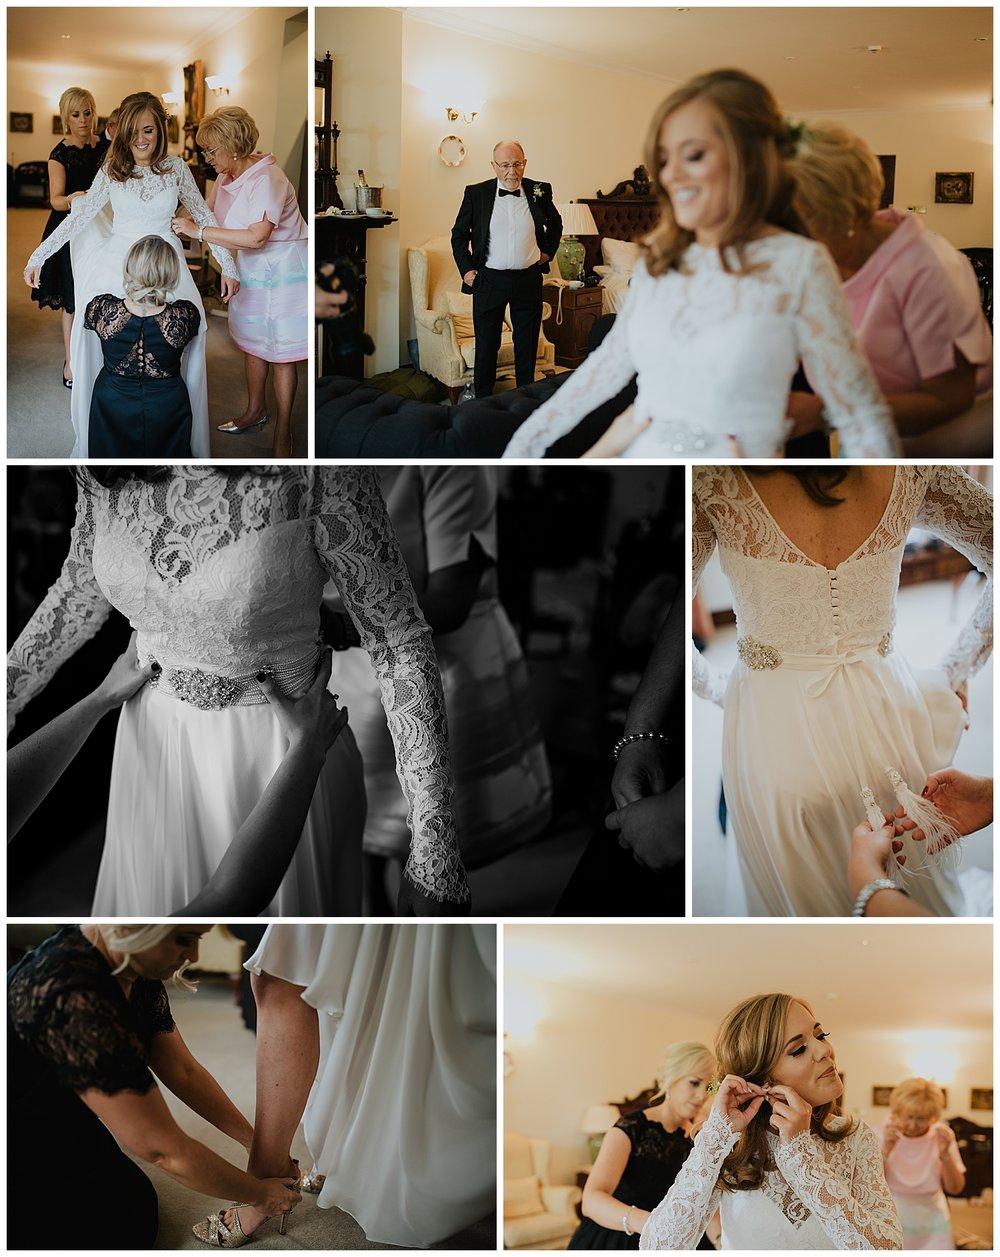 a&c_tinakilly_black_tie_wedding_photographer_livia_figueiredo_50.jpg